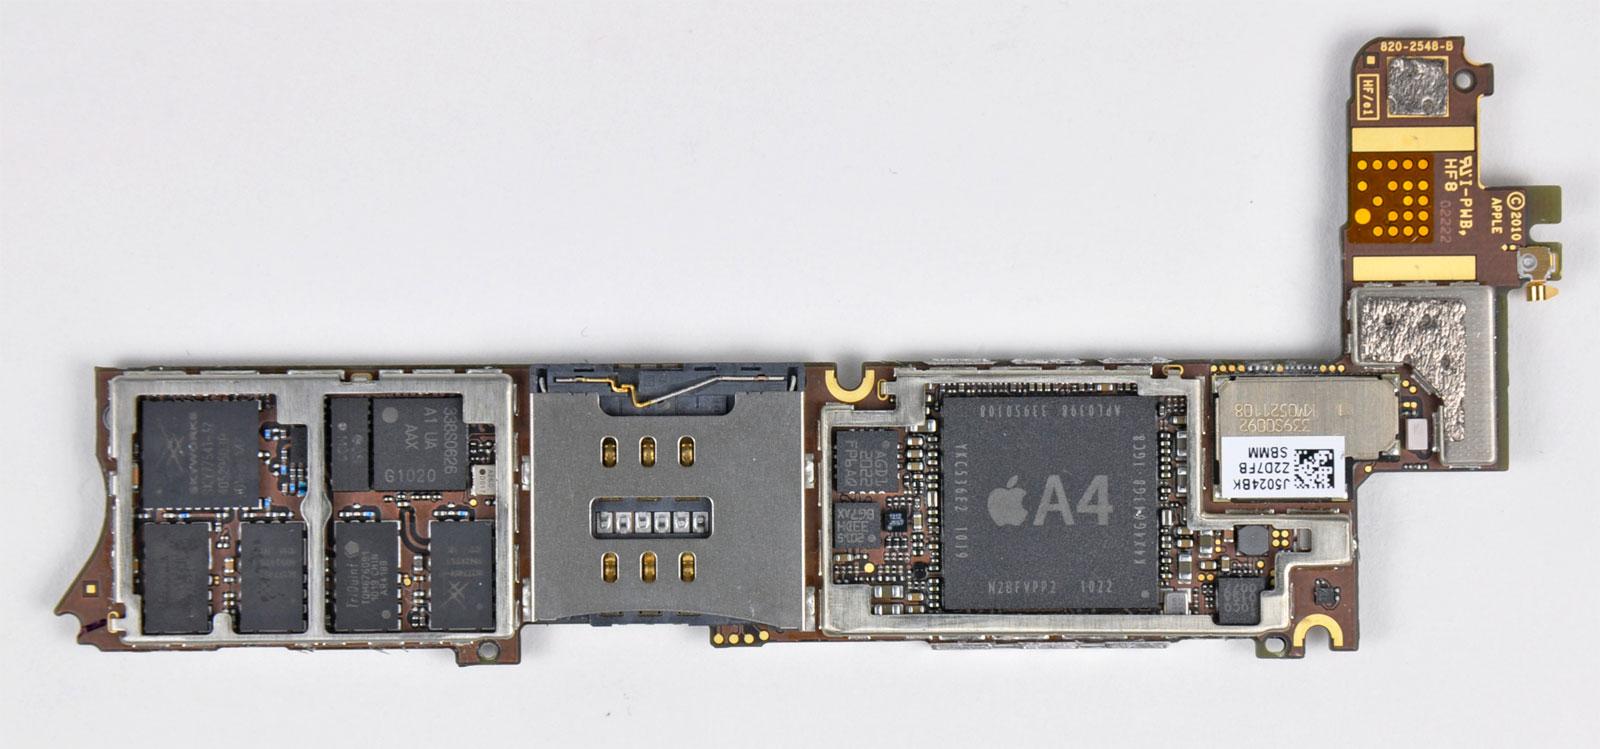 Placa base del iPhone 4